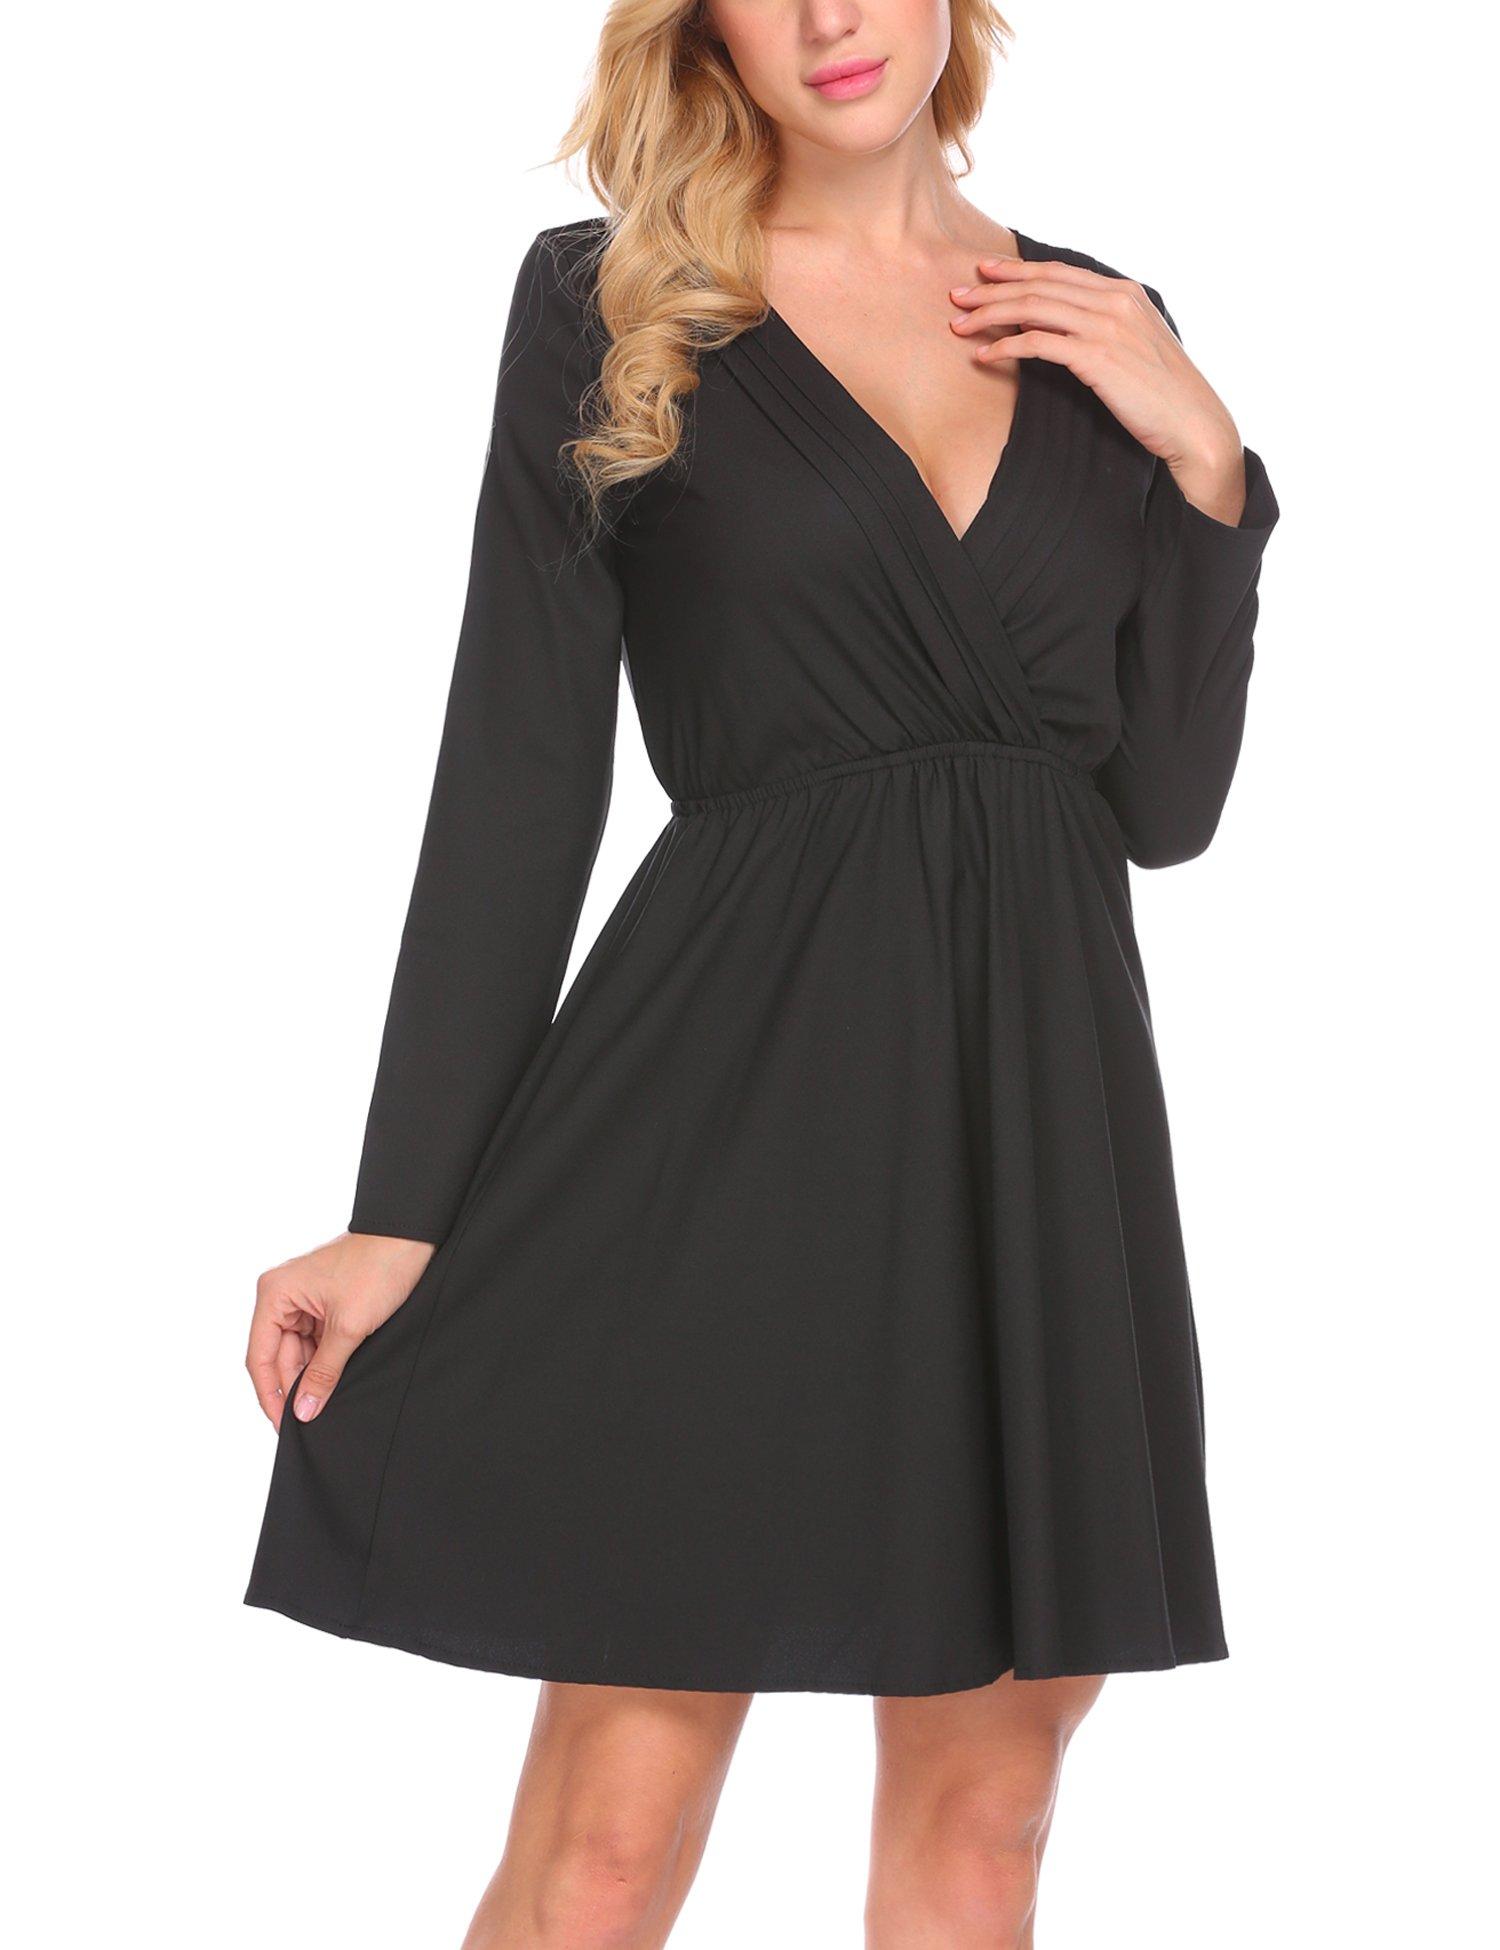 SE MIU Women Casual V Neck Long Sleeve Solid Waist Ruched Pleated Mini Dress,Medium,Black